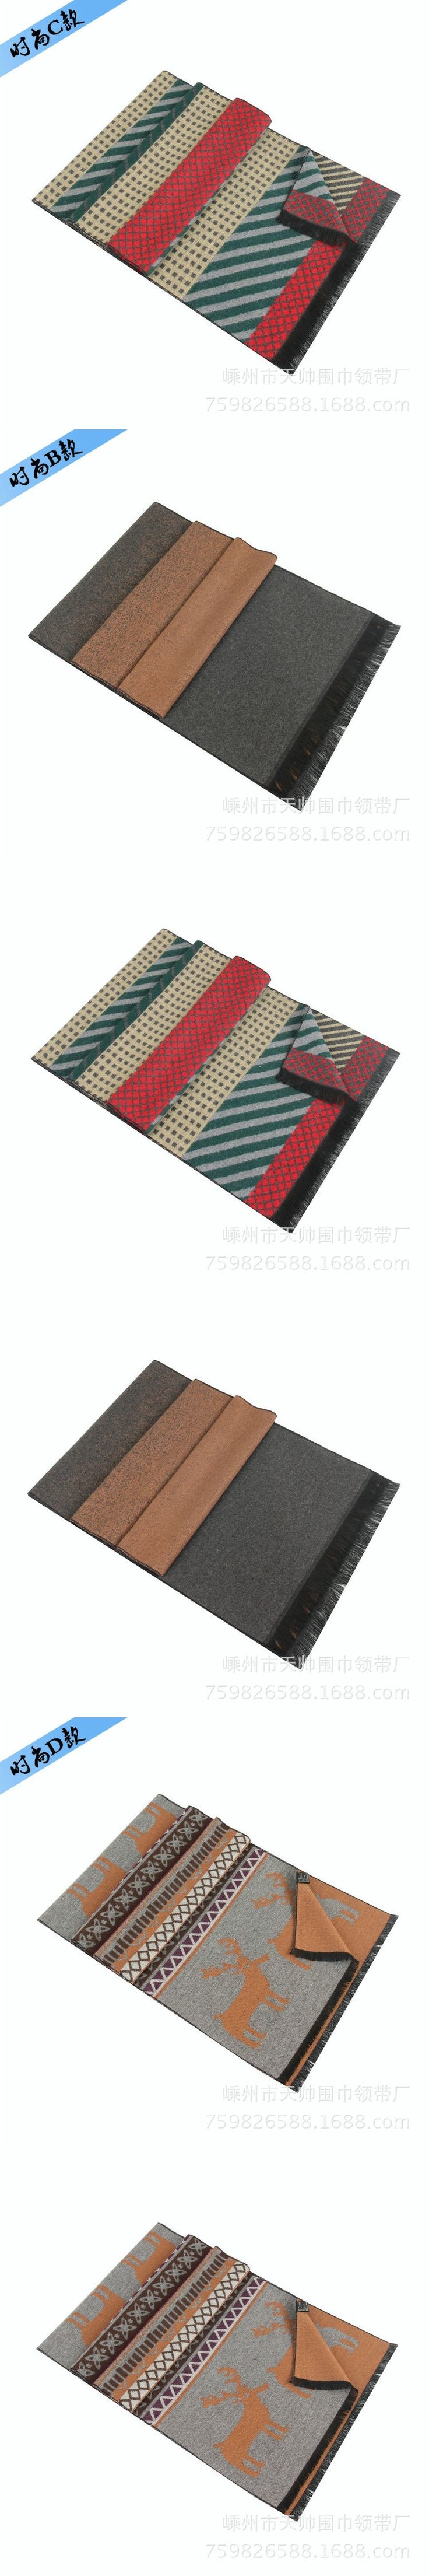 Wholesale 2016 New Men's Scarf Autumn Winter Korean Fashion Cotton Scarves Double Sided Jacquard Lattice Christmas Deer Scarfs